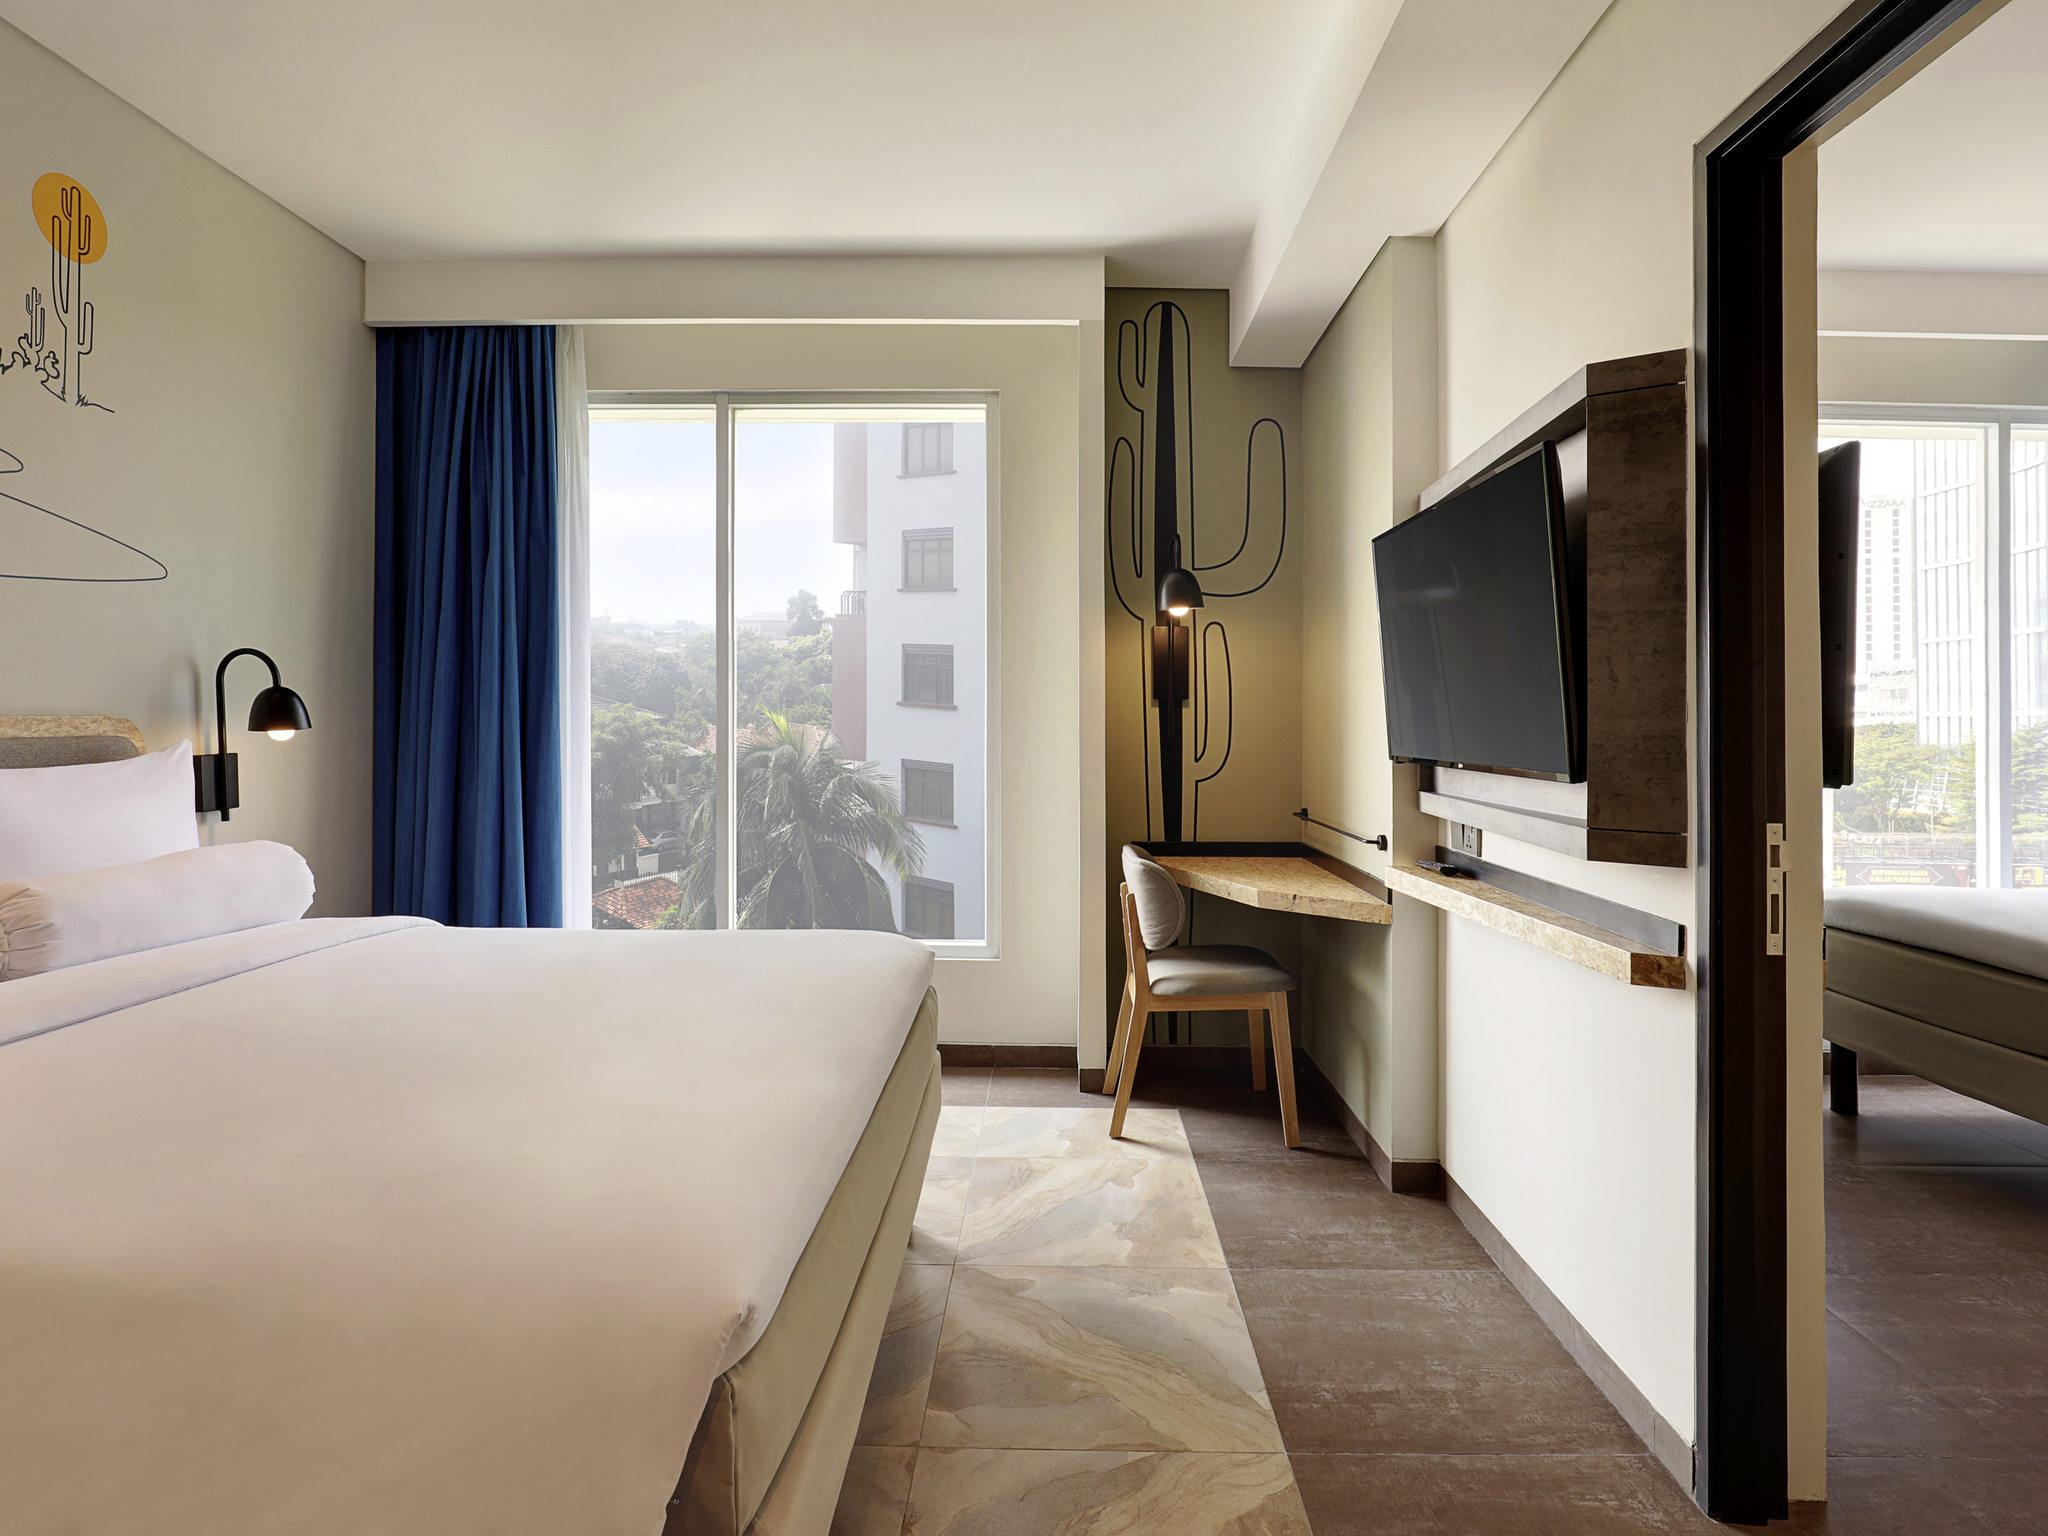 Hotel in jakarta - ibis Styles Jakarta Simatupang